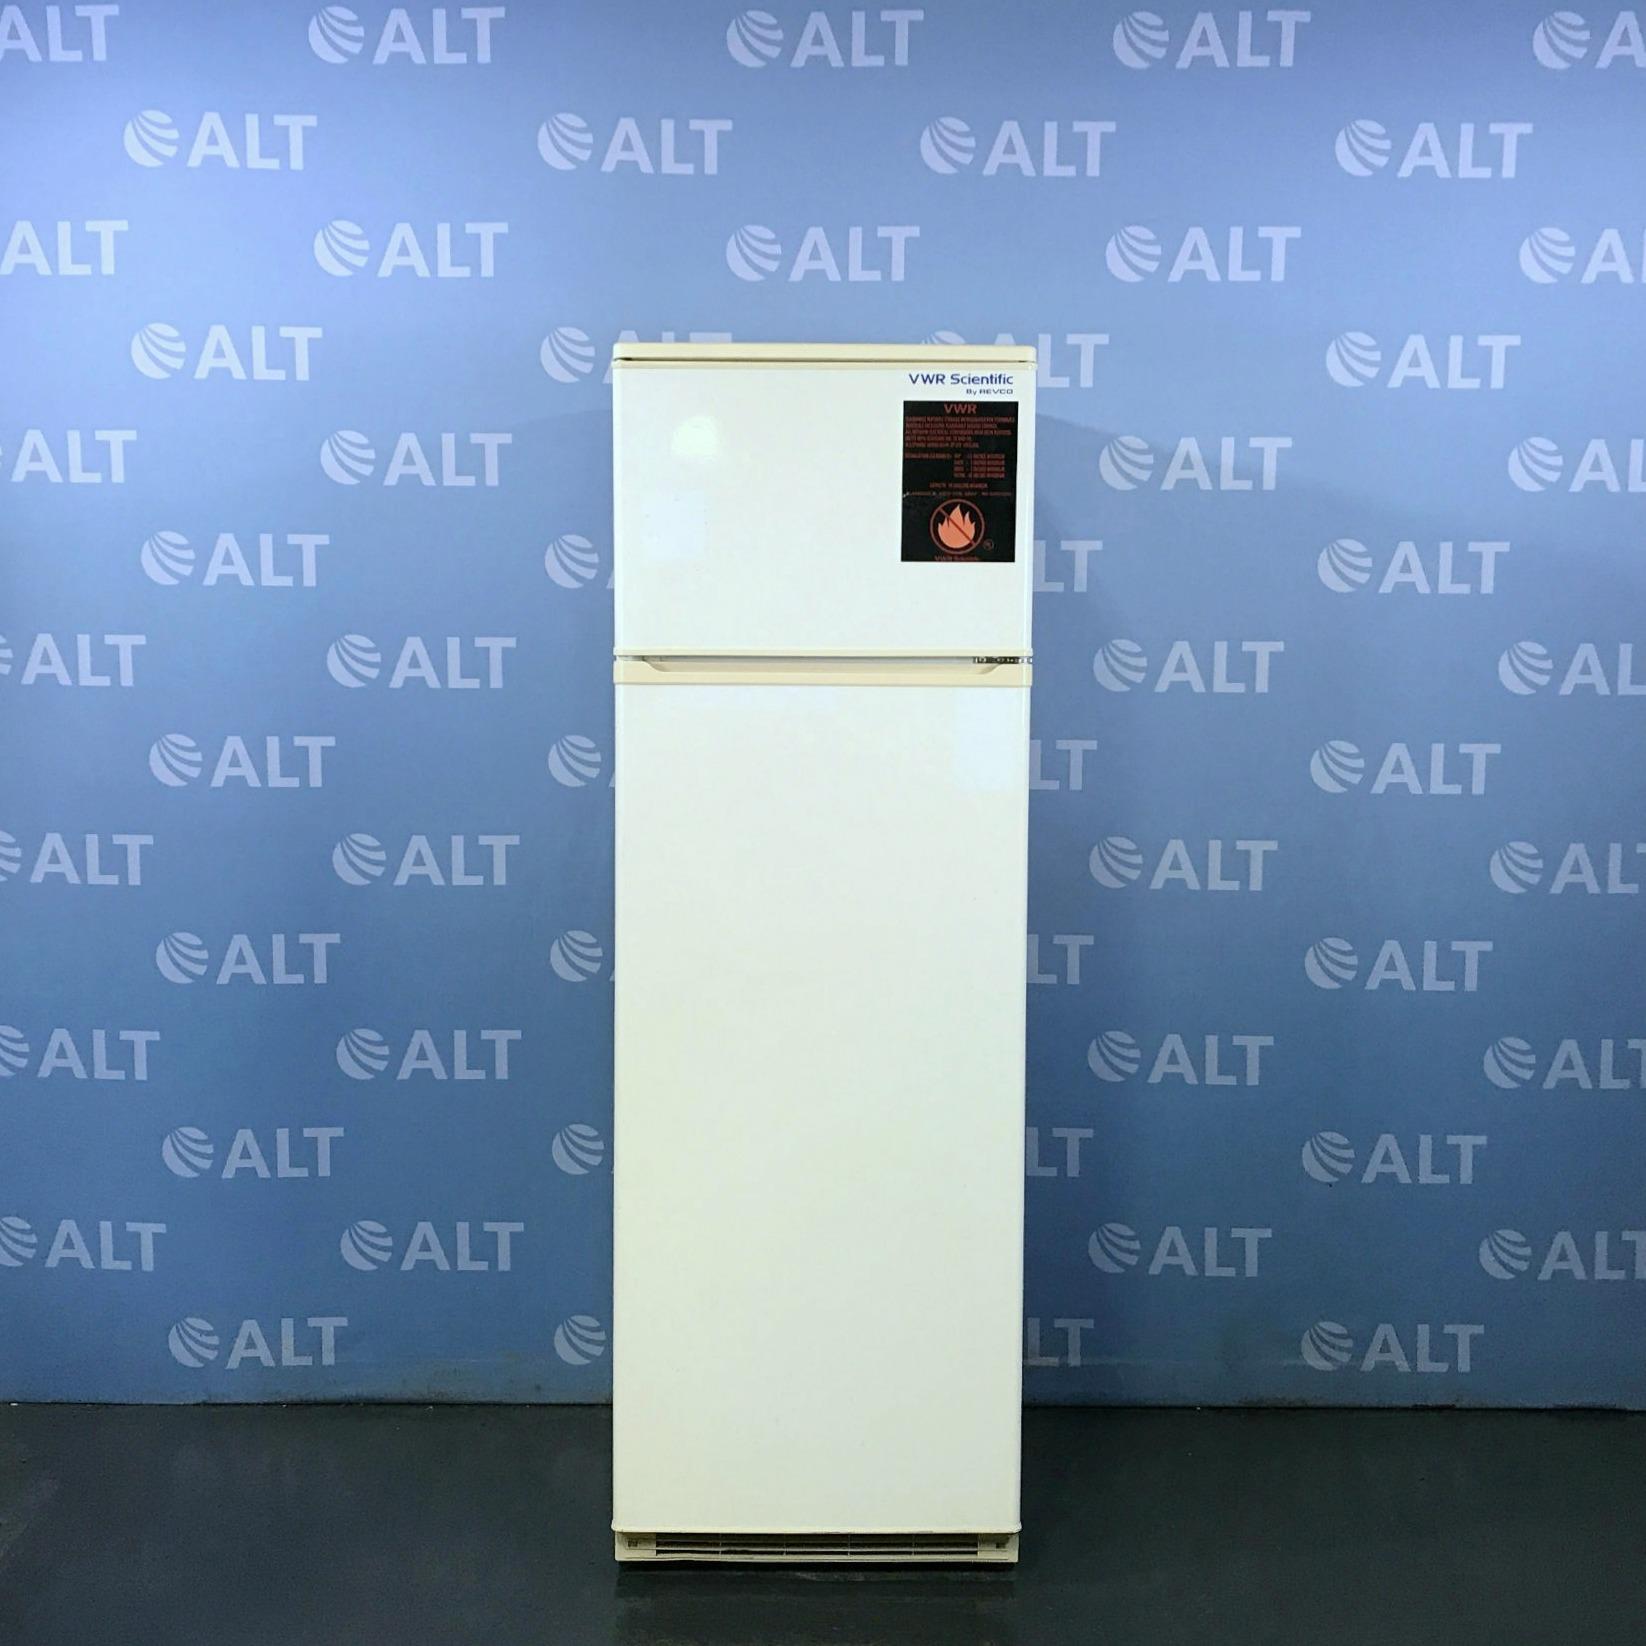 VWR Scientific Explosion-Proof Refrigerator/Freezer Model R415FA14 Image